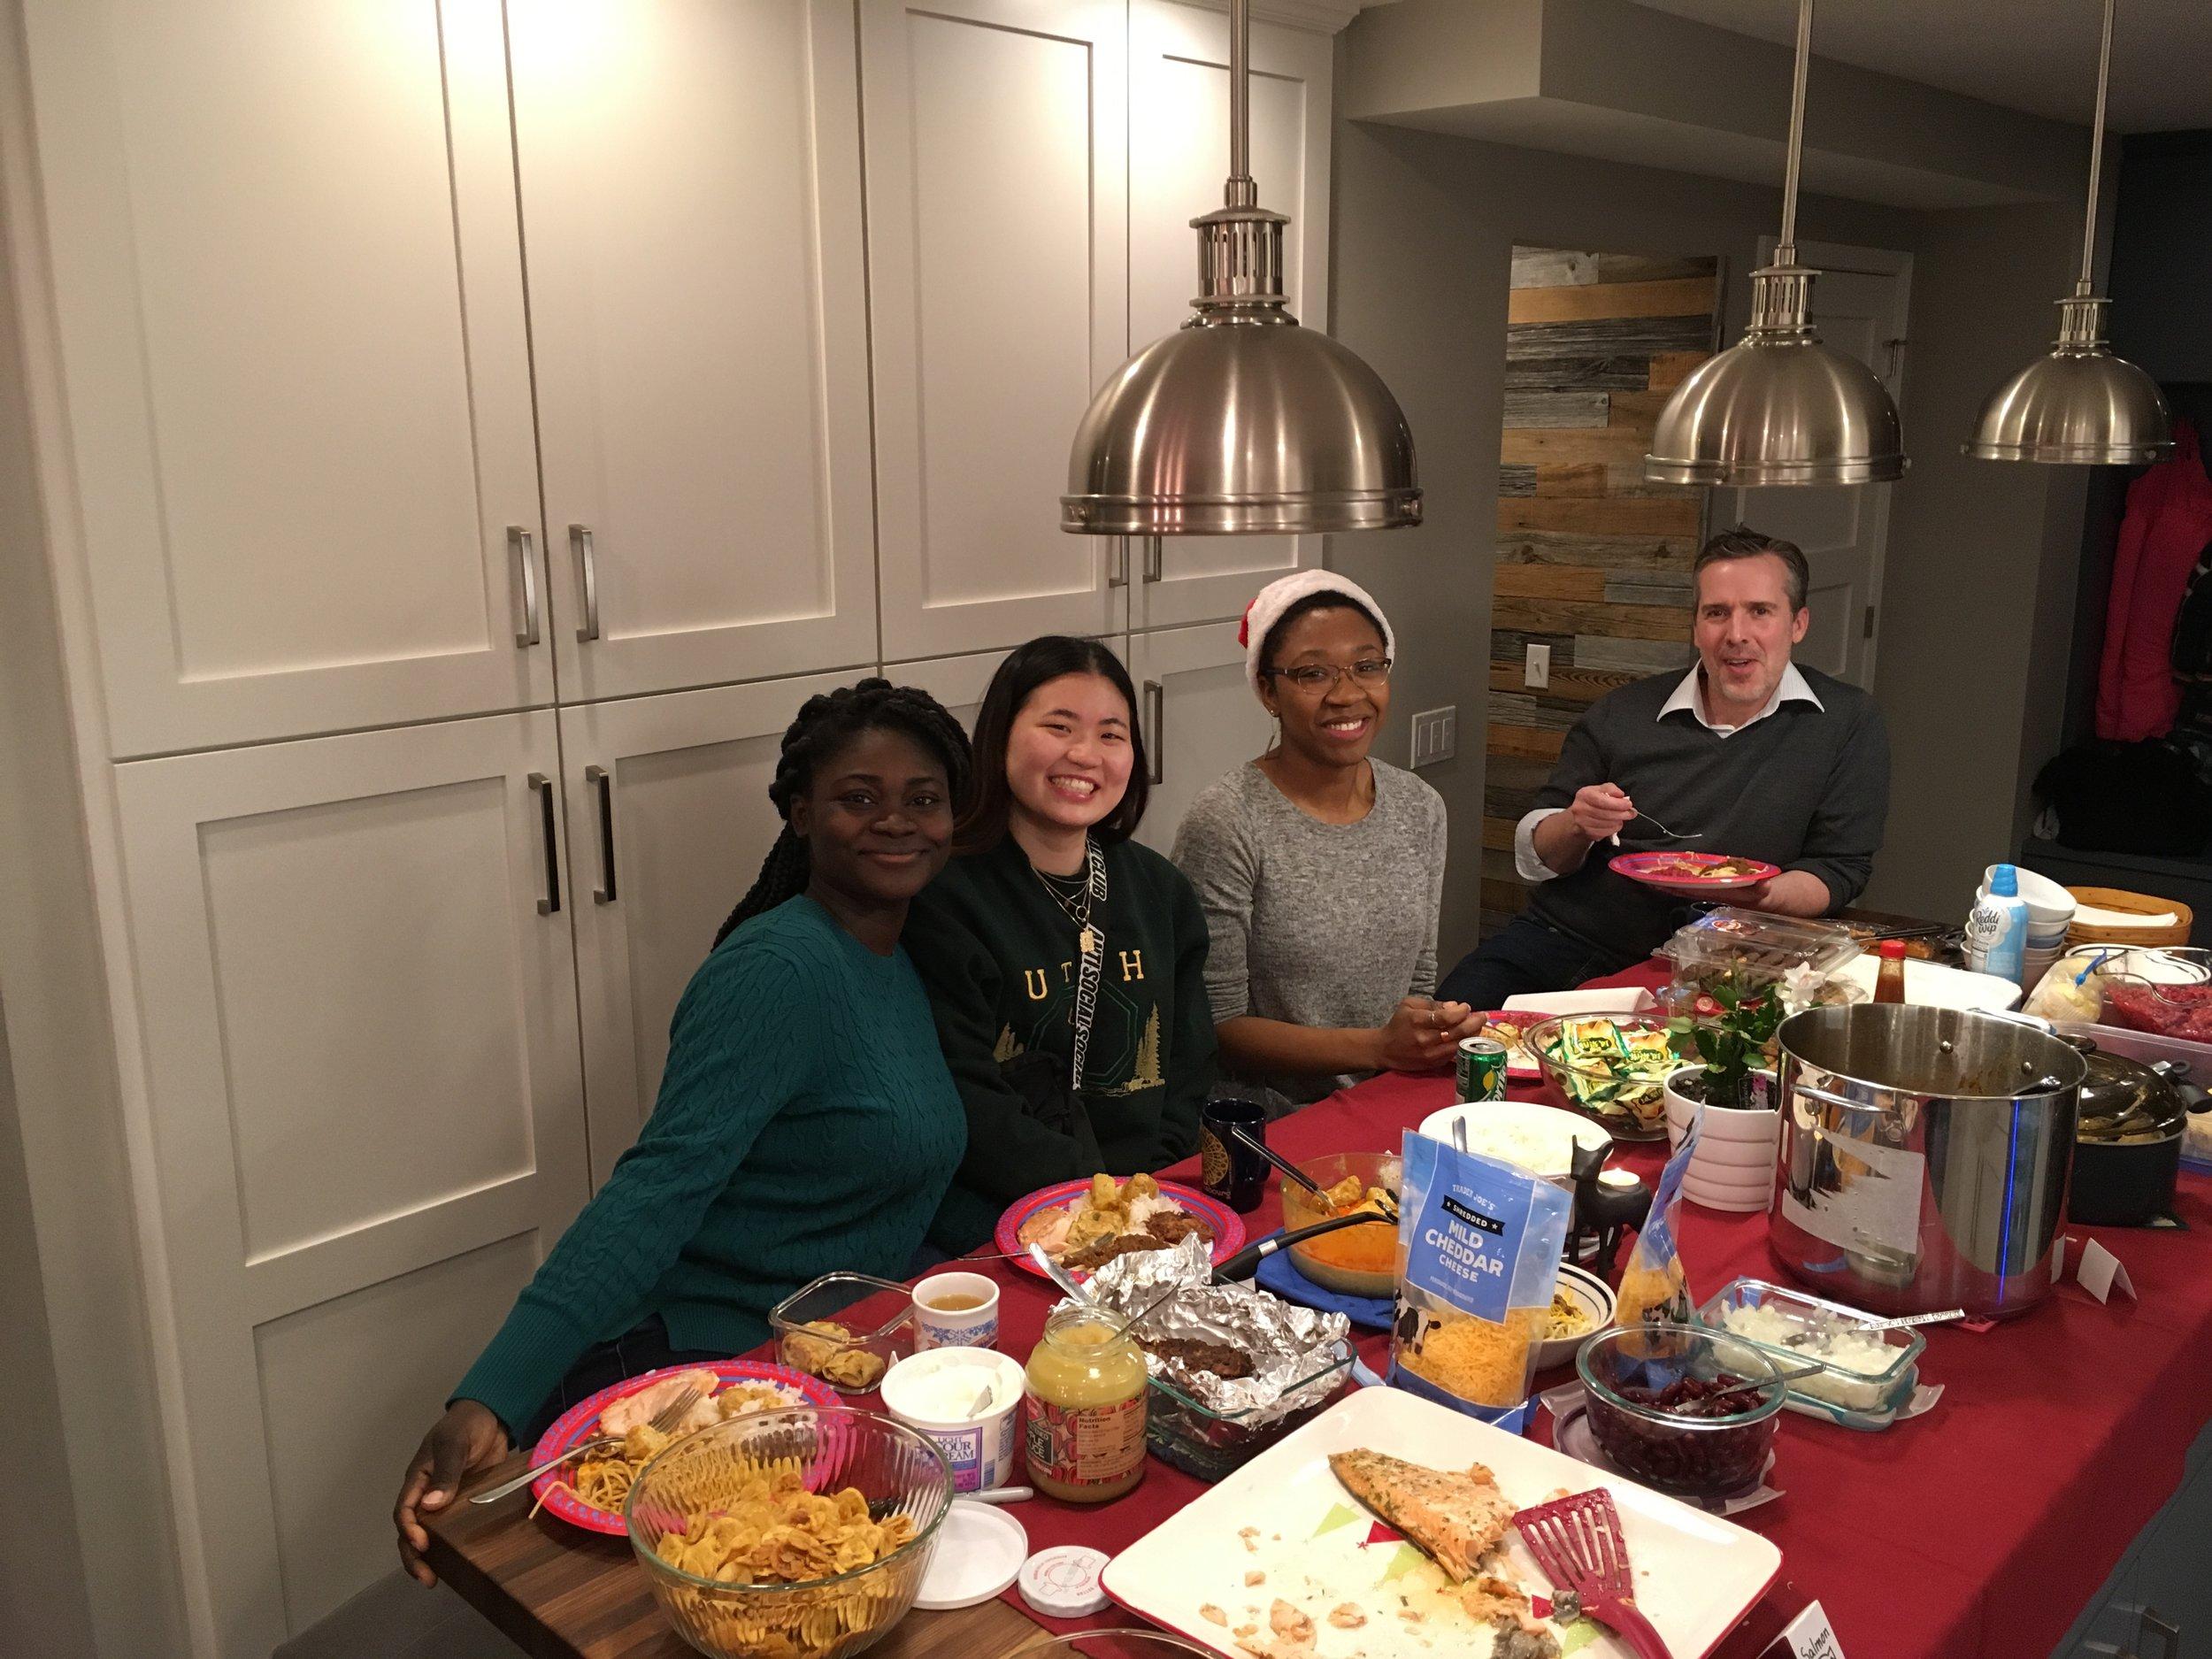 Holiday party potluck 2018!